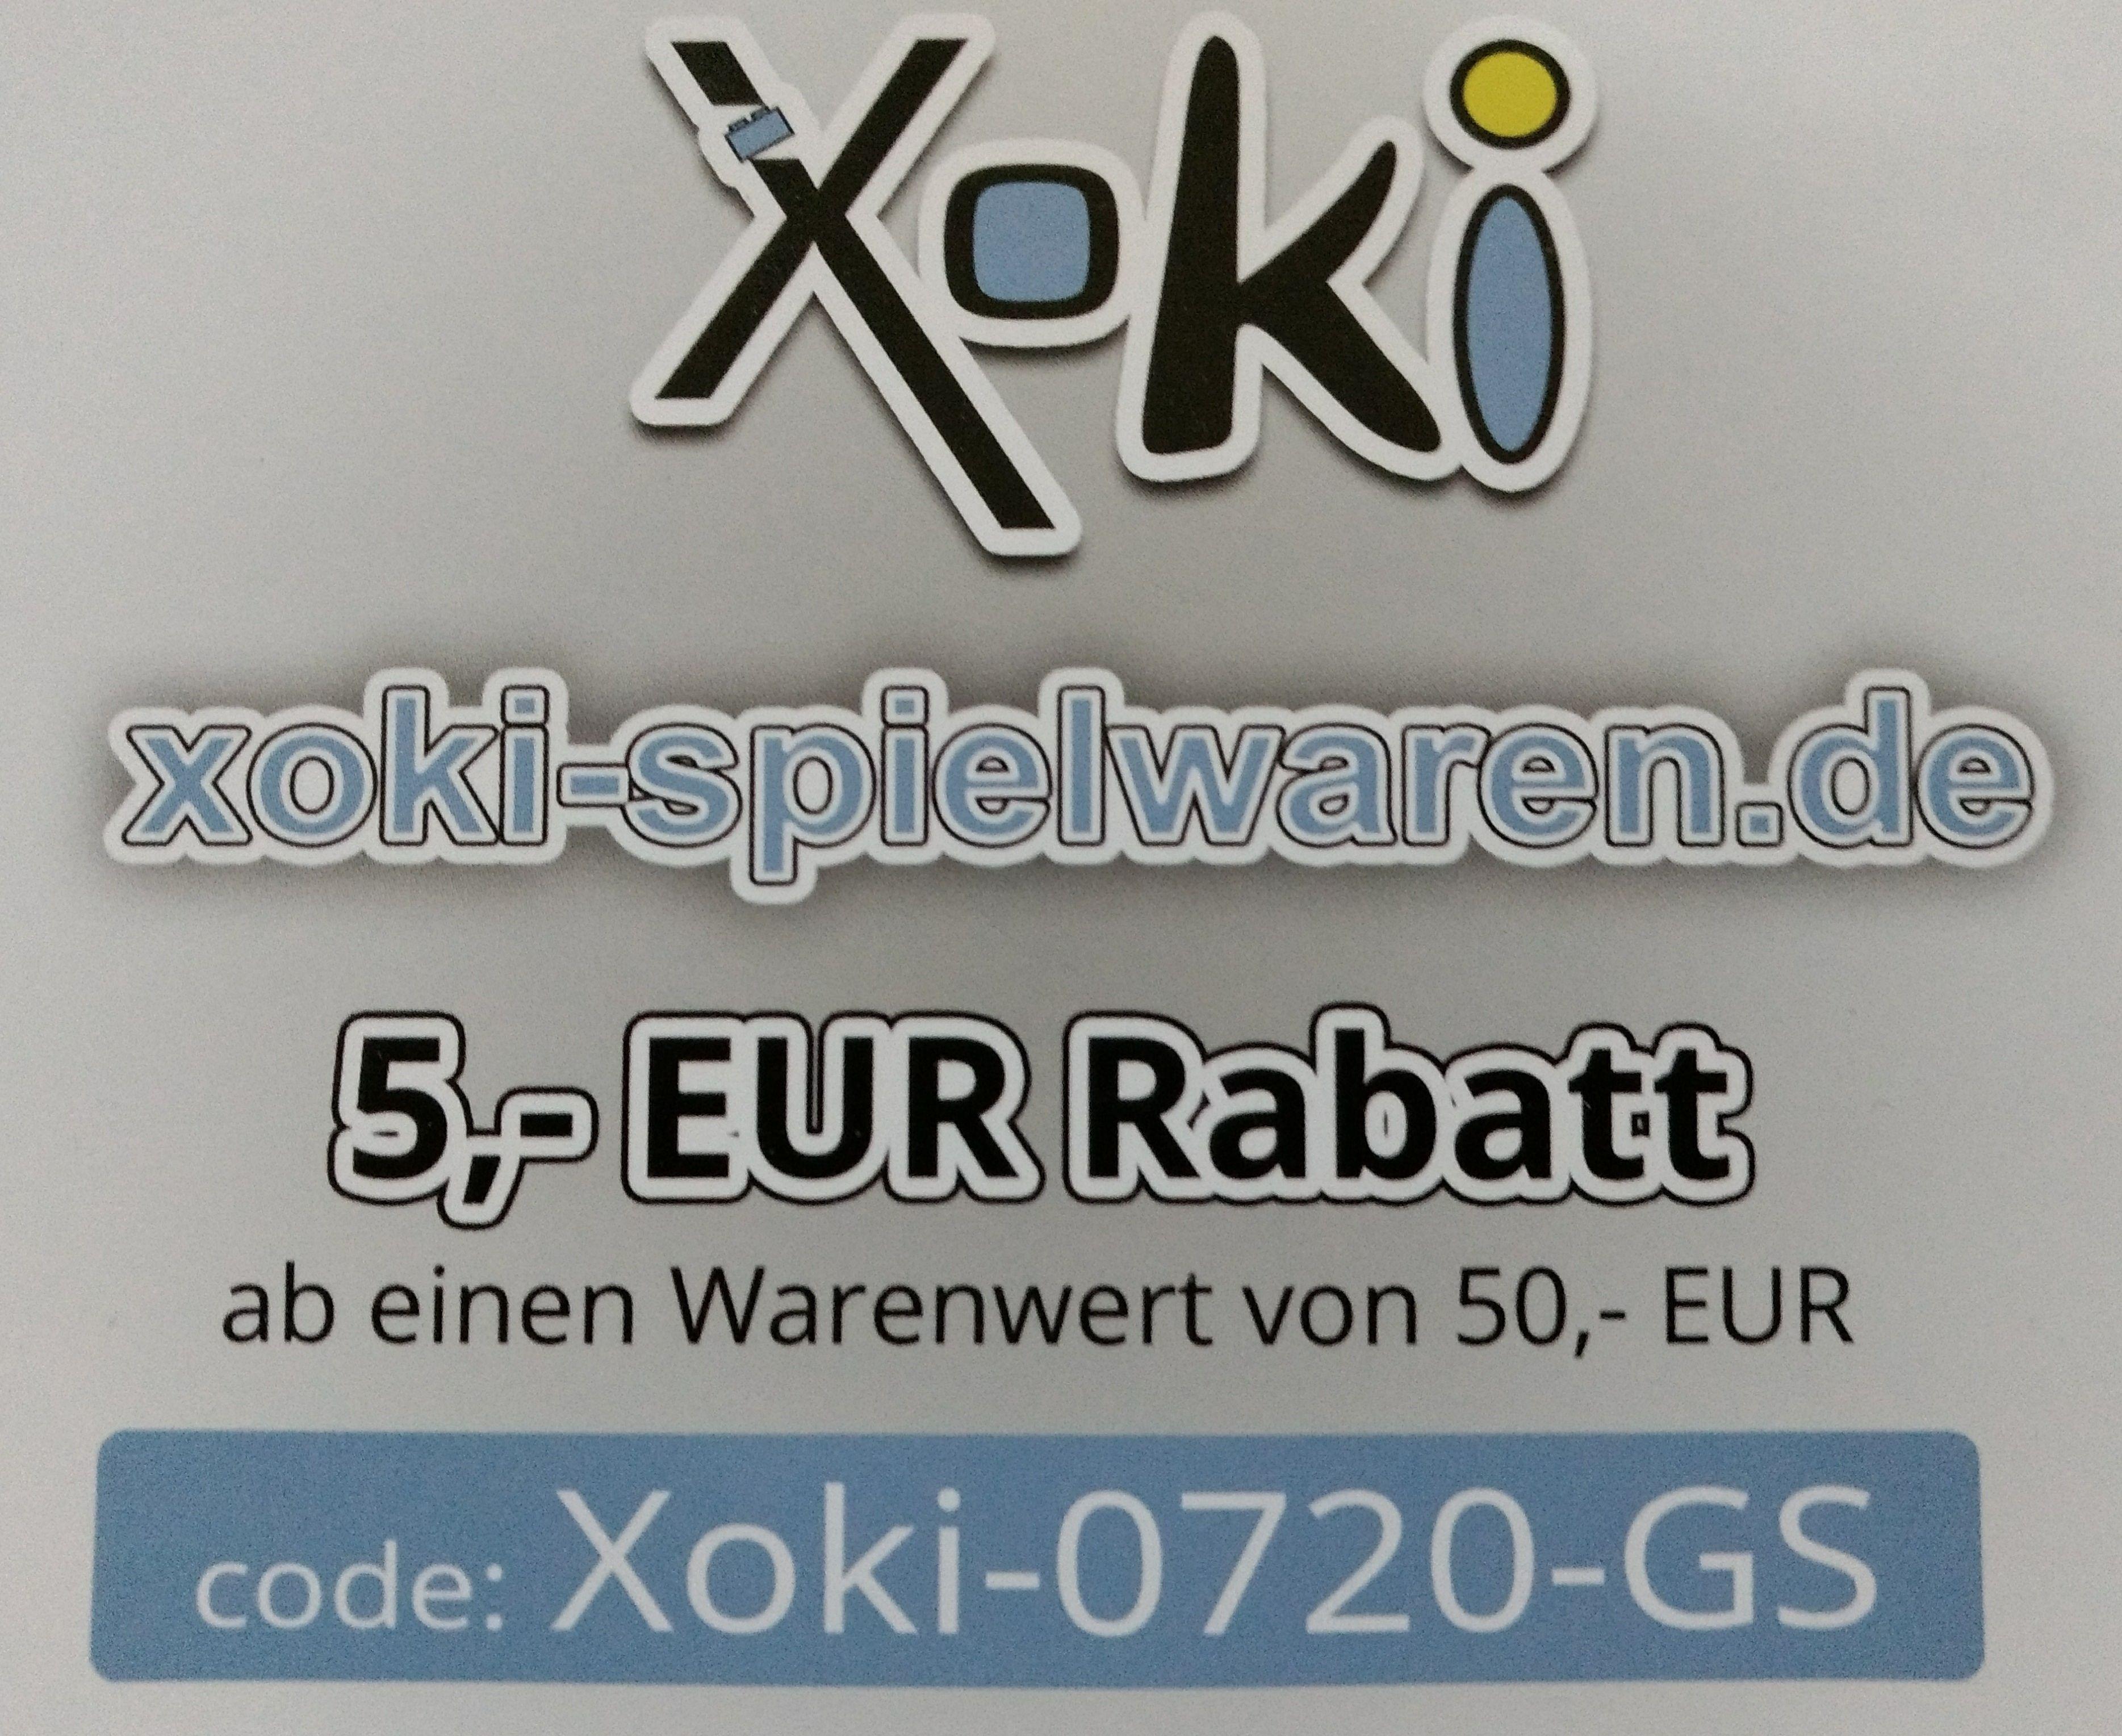 63860-MKRFQ.jpg